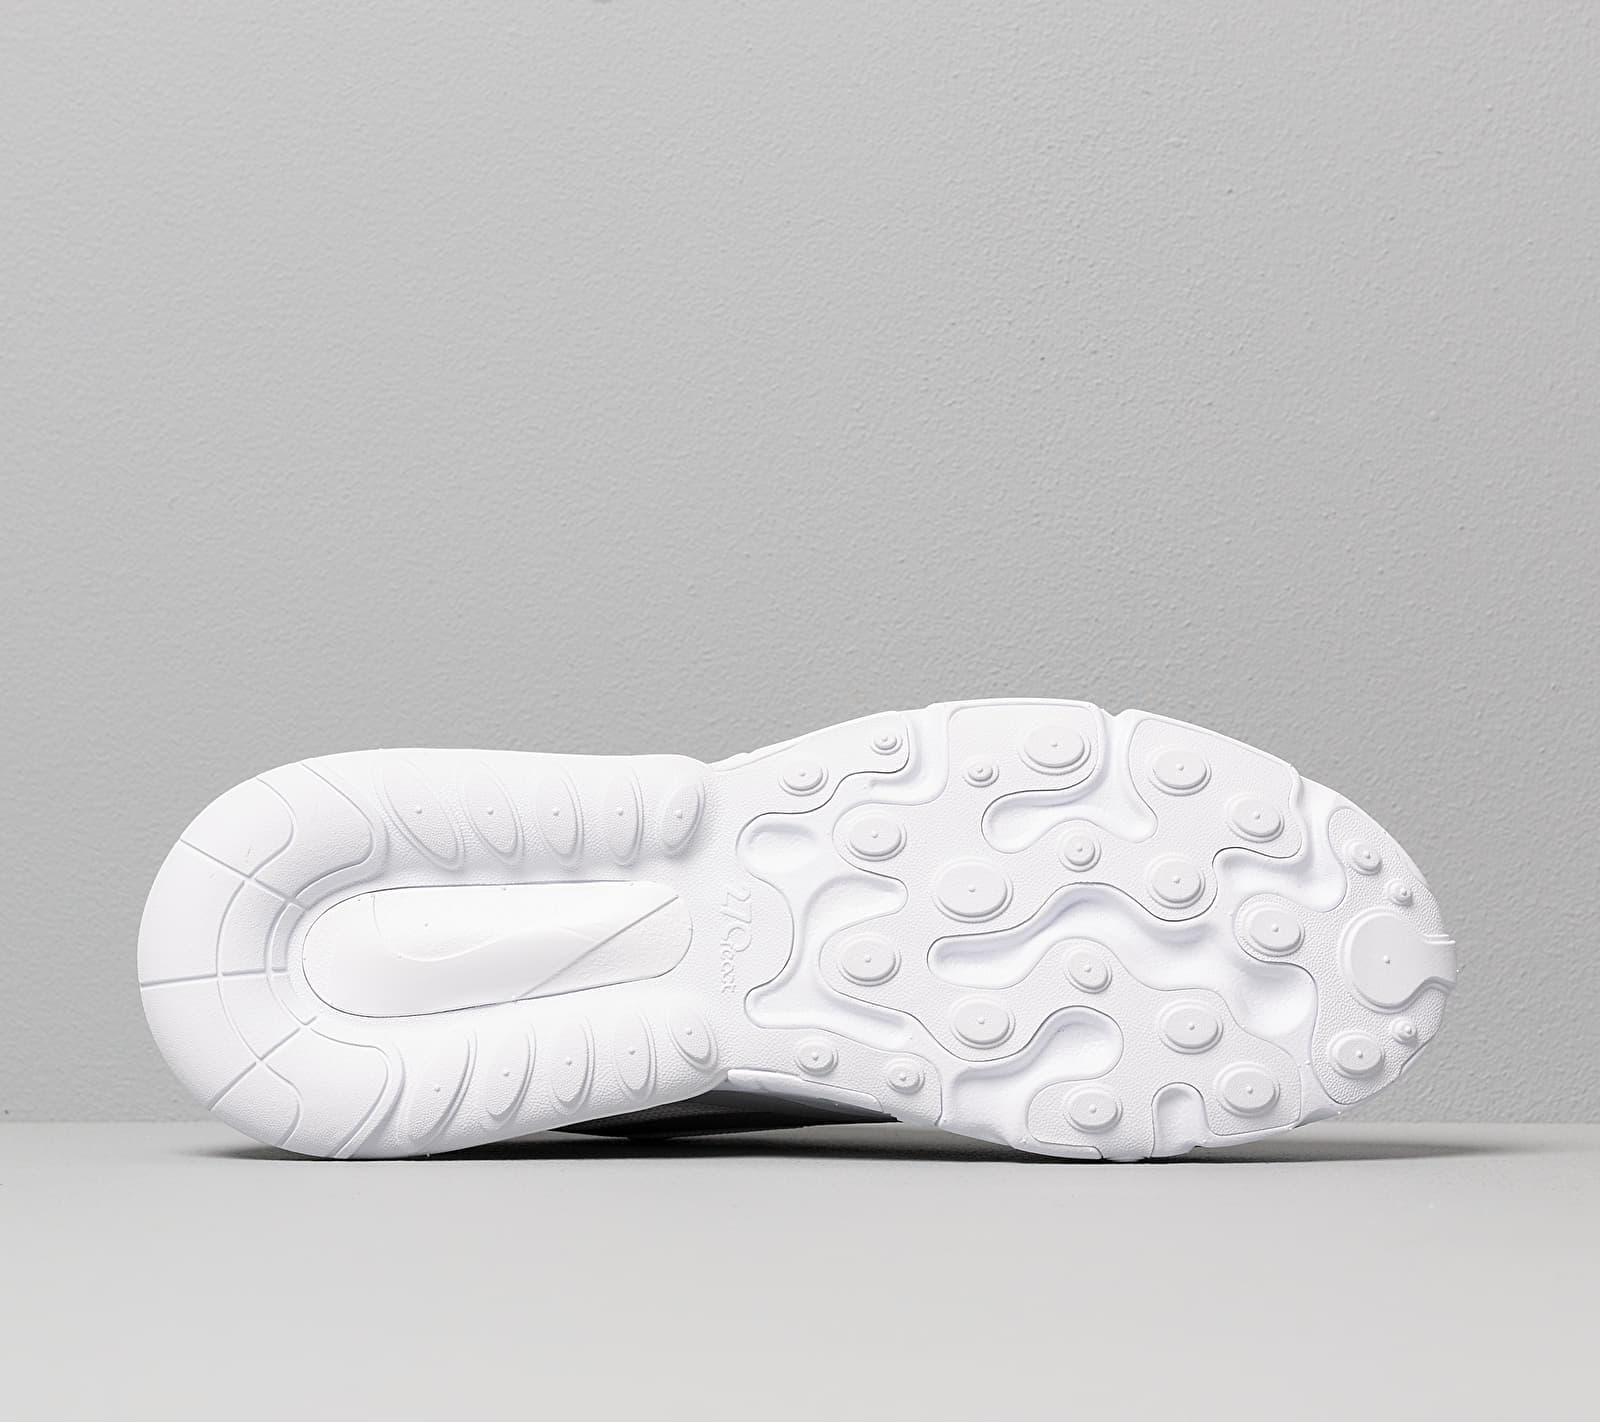 Nike Air Max 270 React White/ Lt Smoke Grey-Pure Platinum